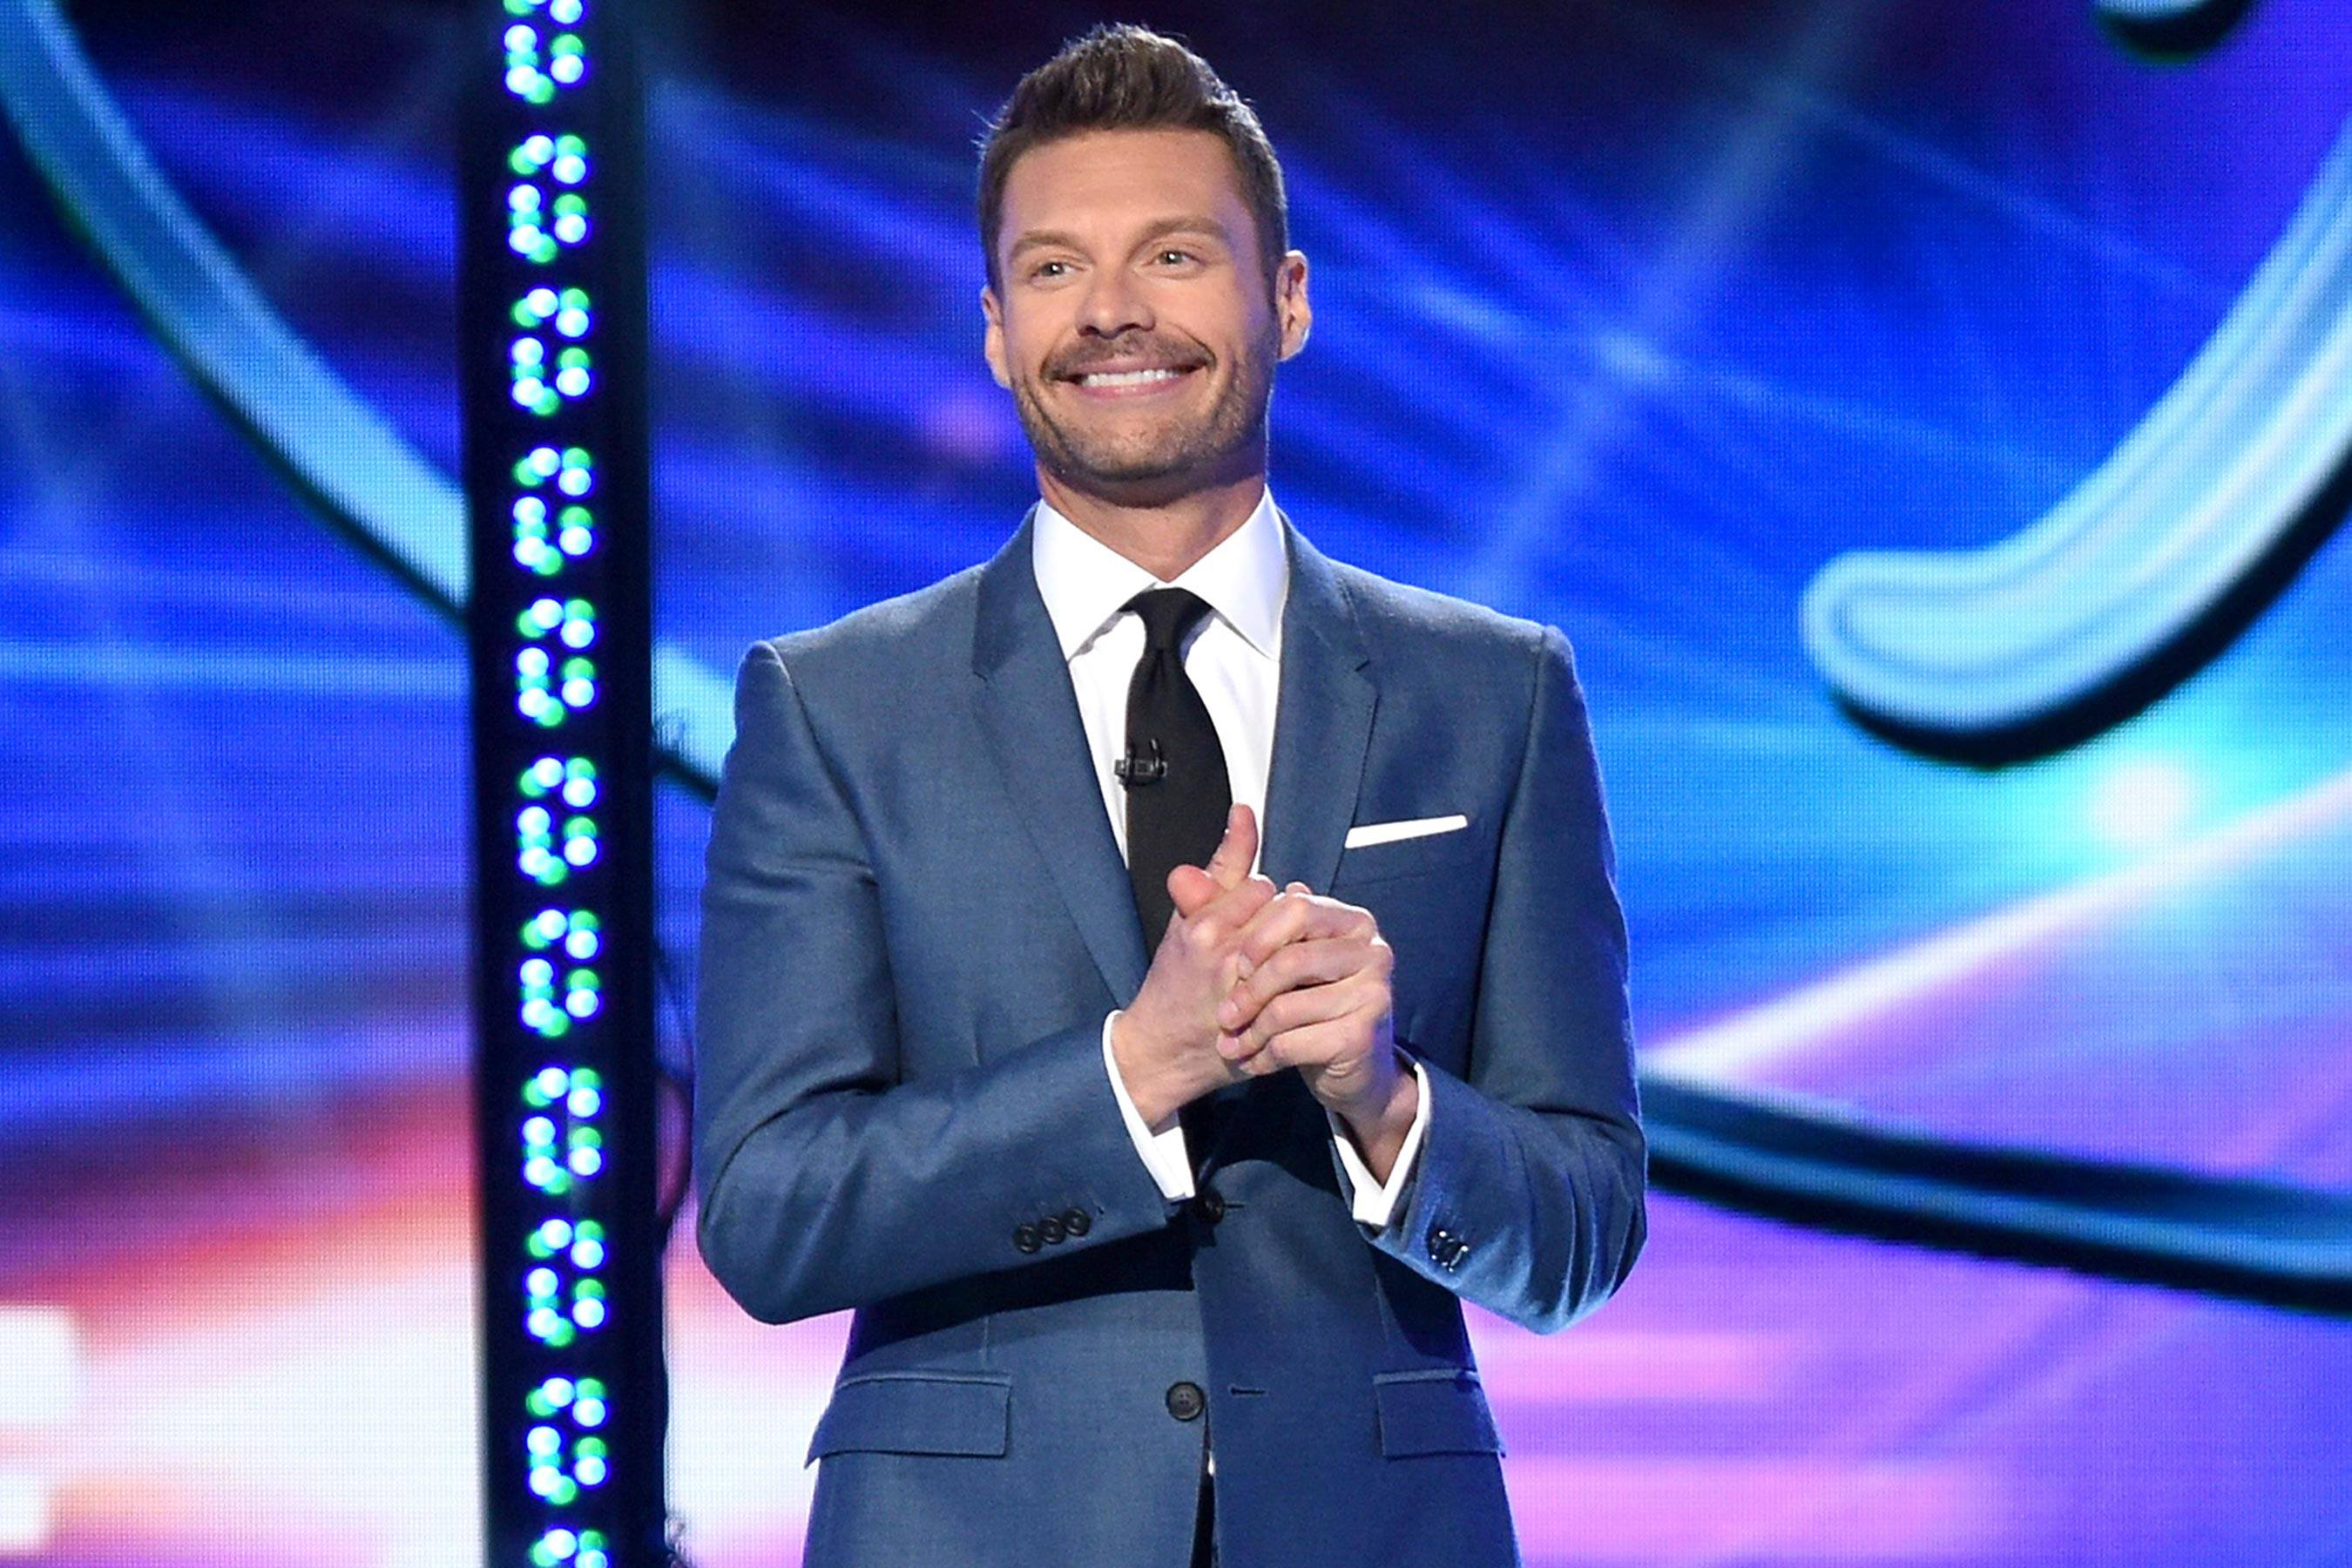 Ryan Seacrest hosting American Idol